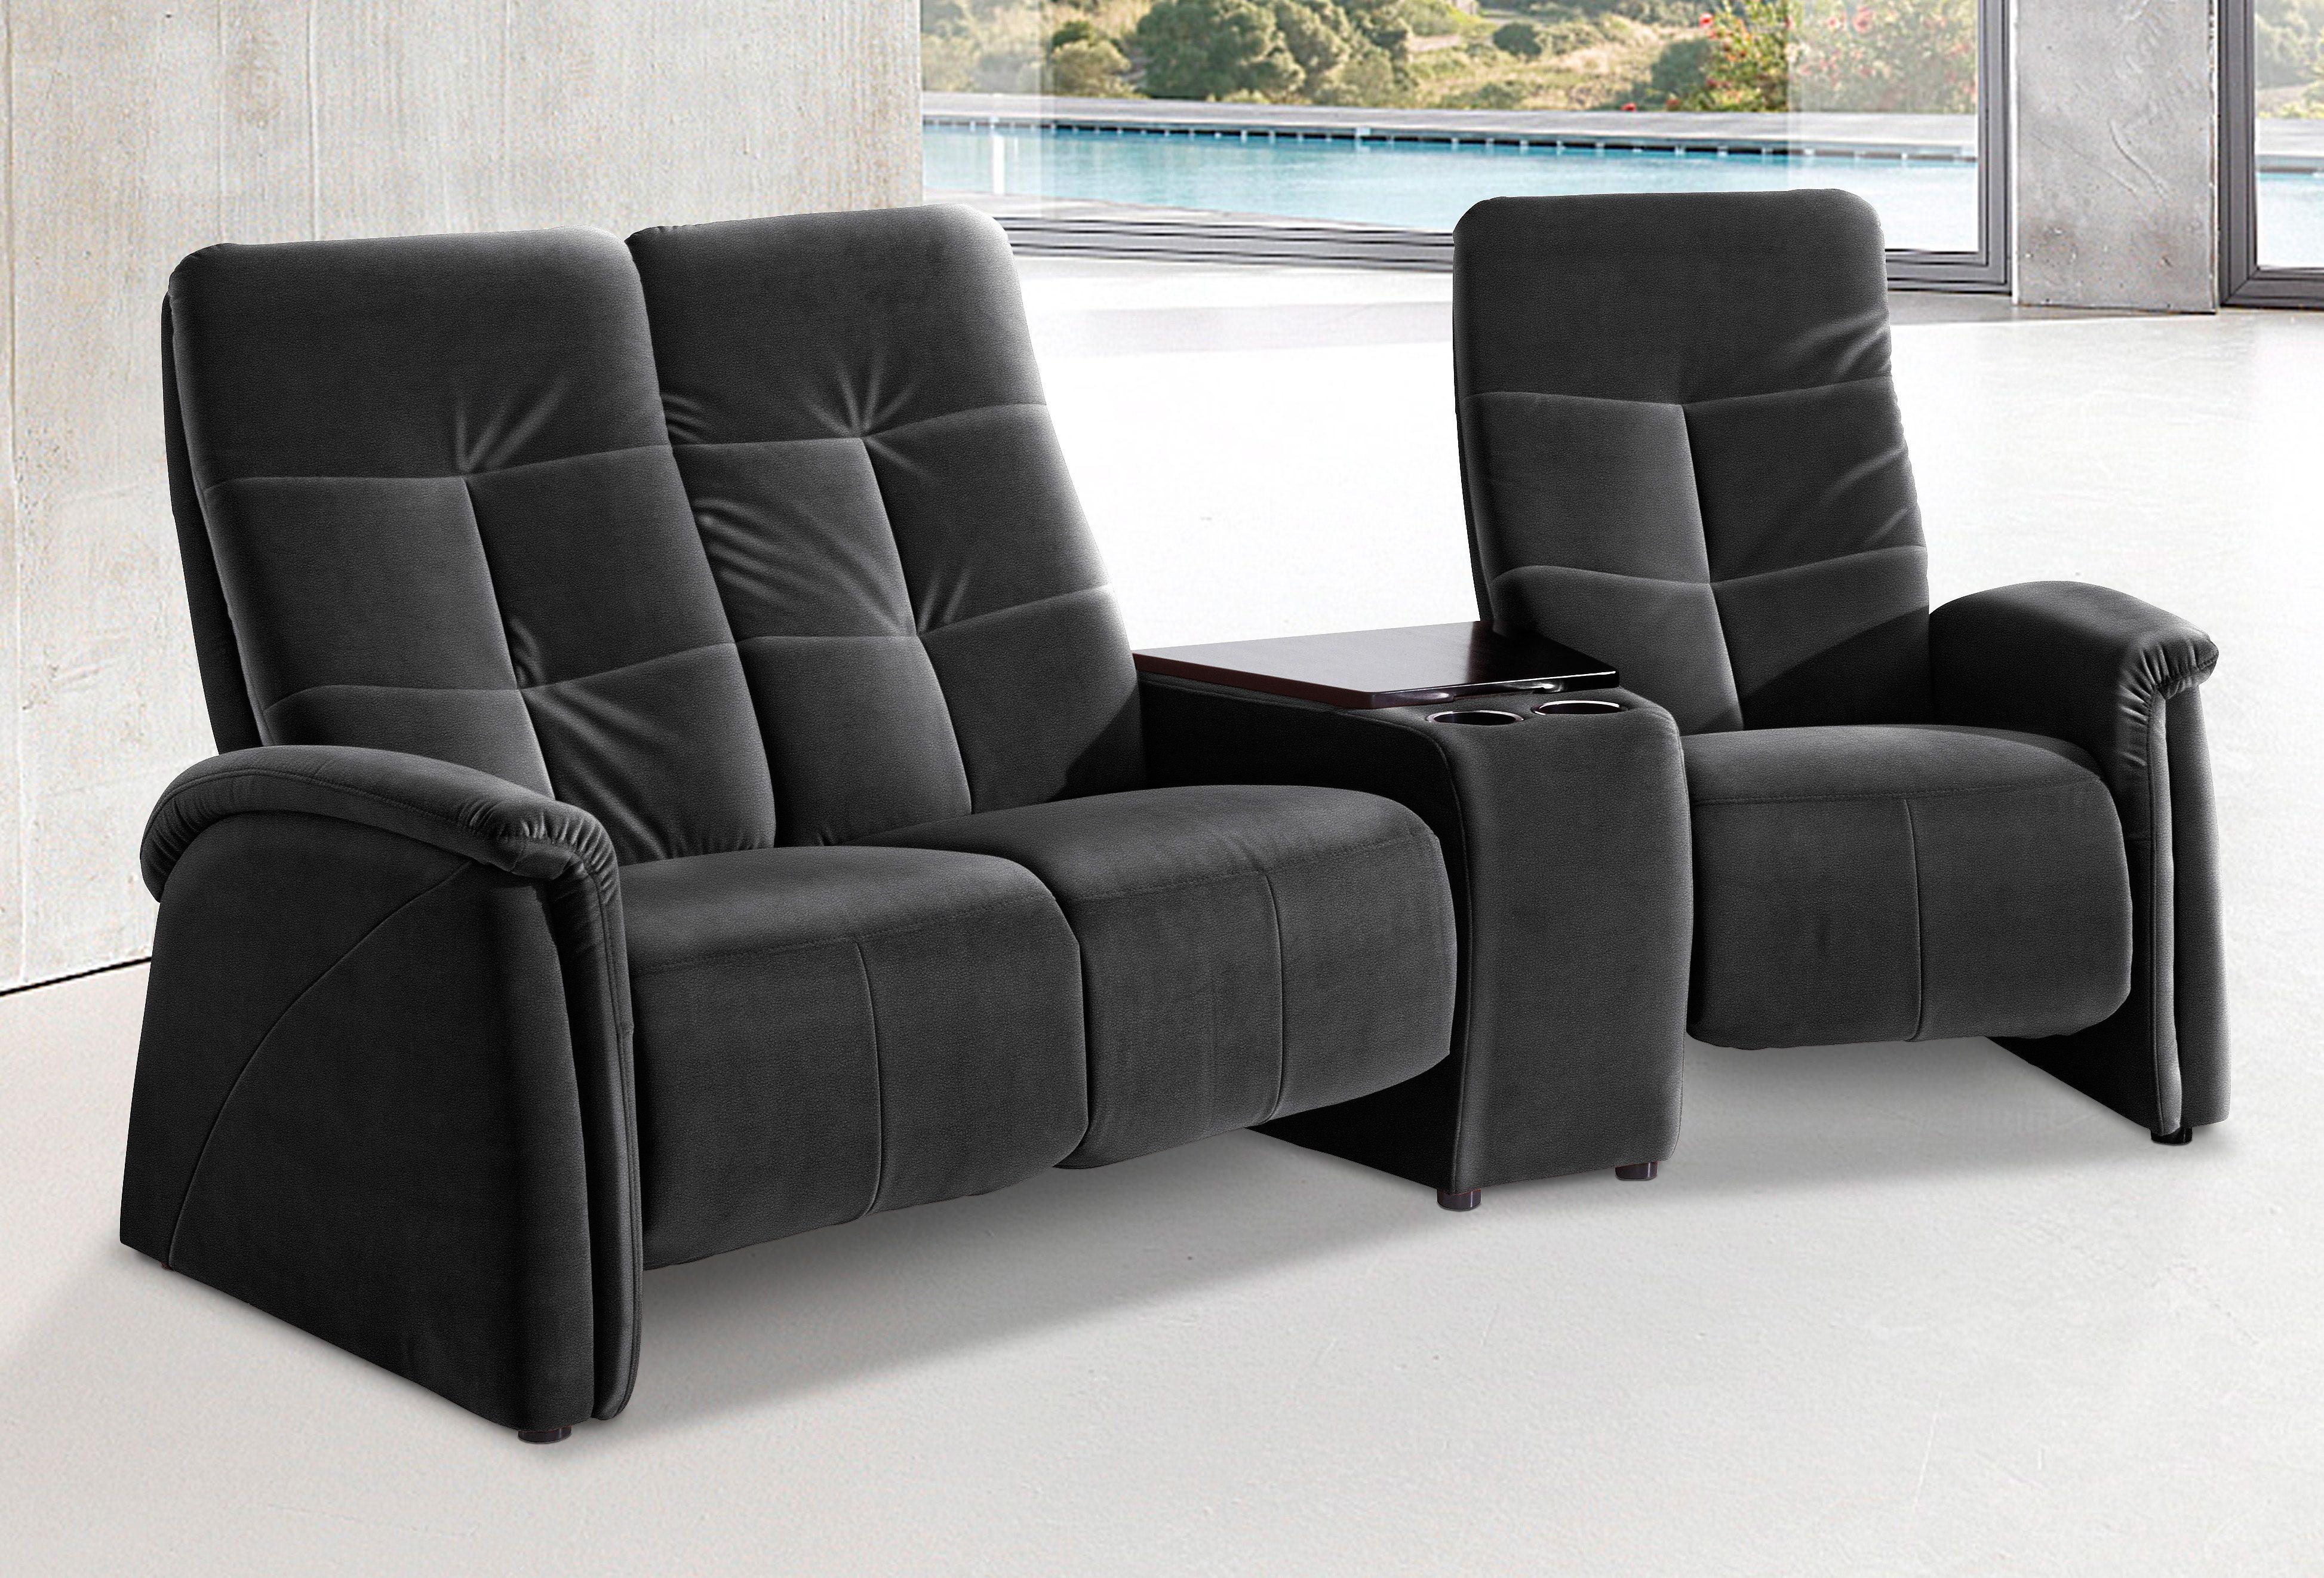 exxpo - sofa fashion 3-Sitzer bestellen   BAUR